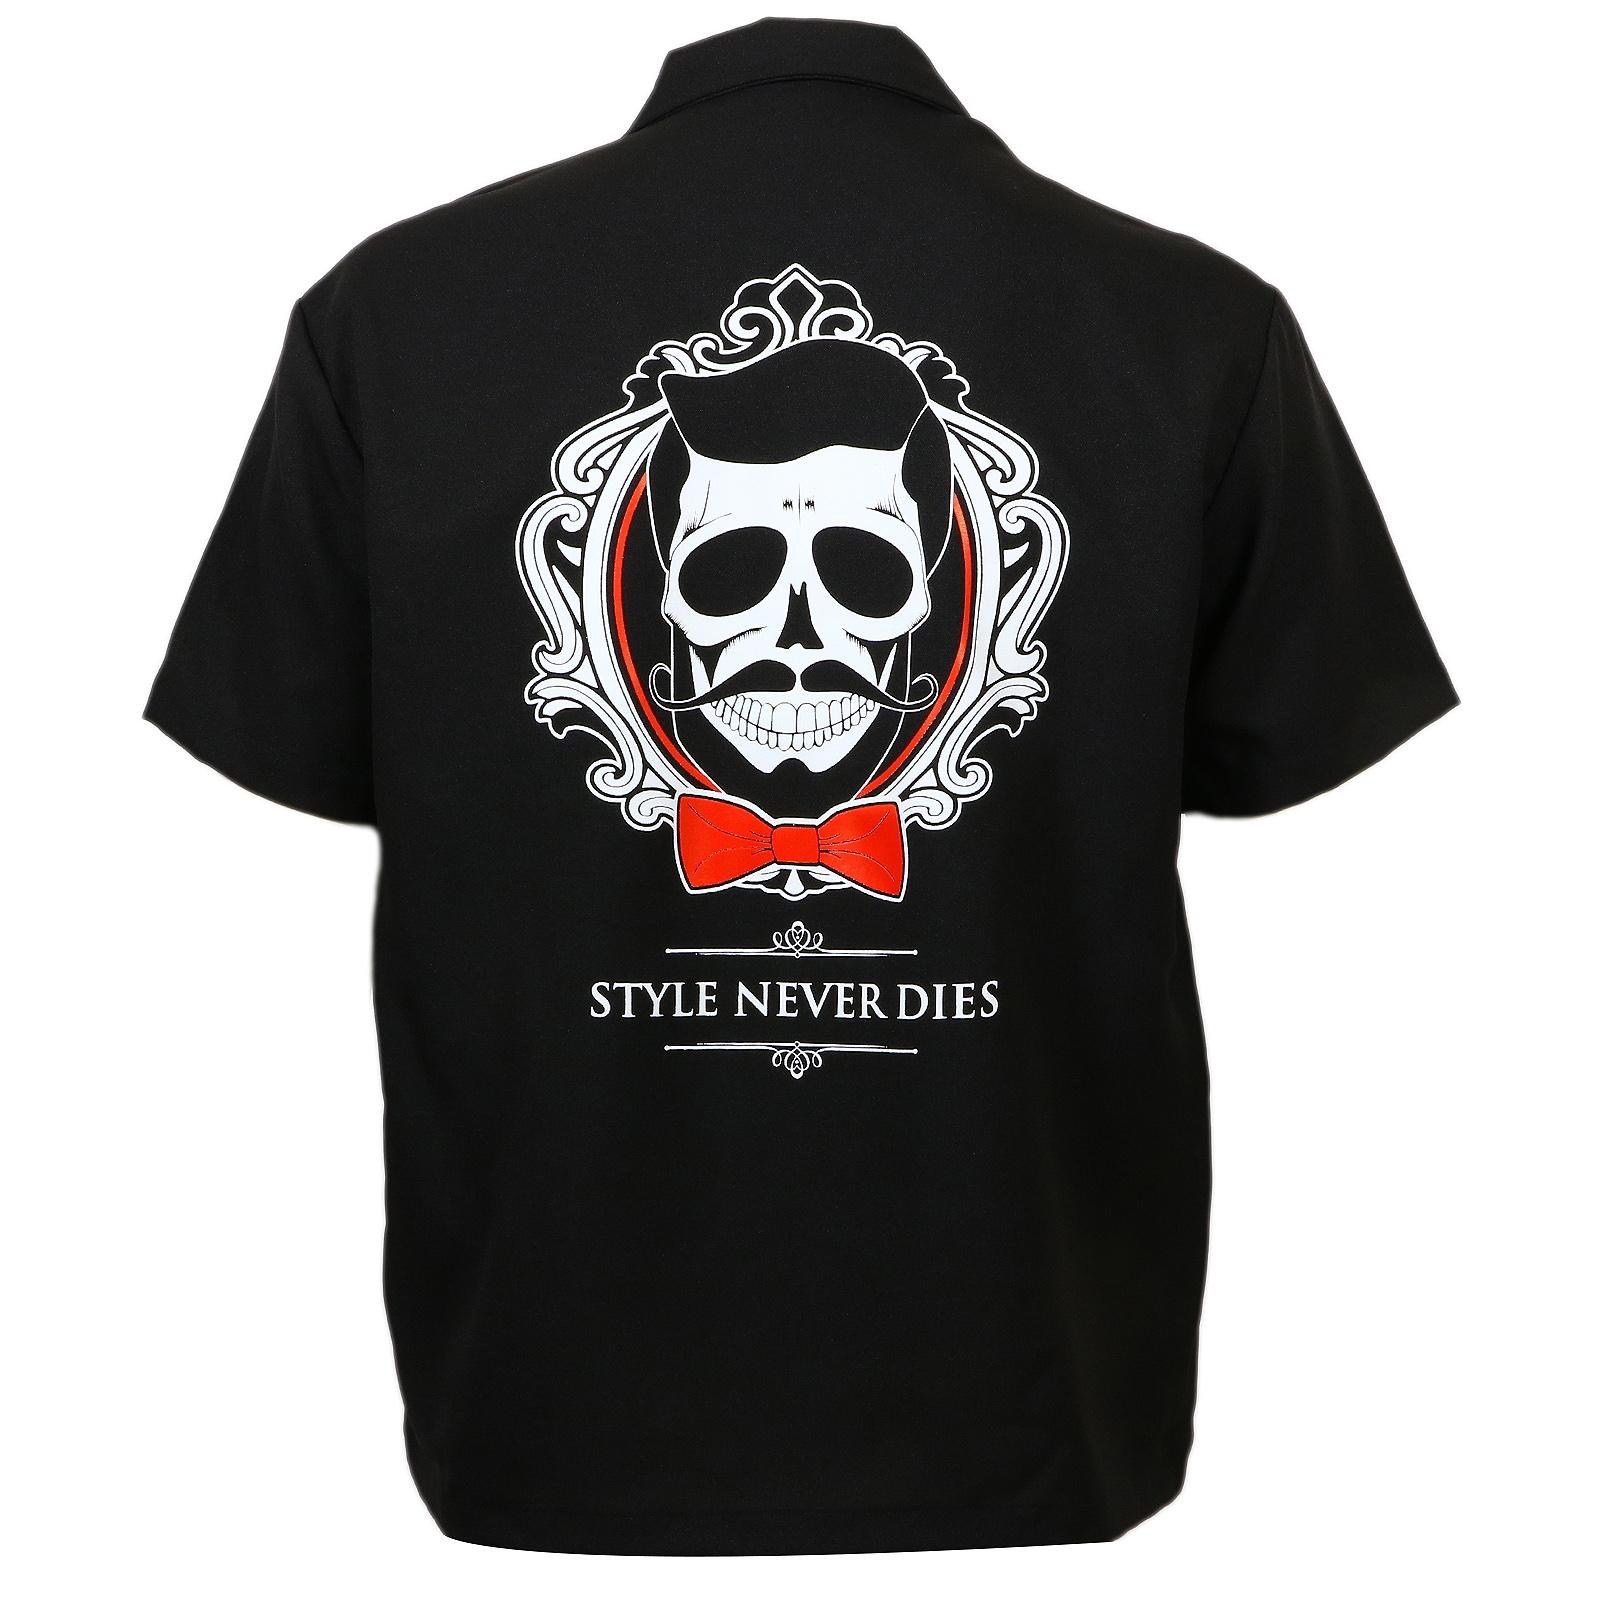 Authentic DON JUAN POMADE Jumbo Style Never Dies Logo T-Shirt Black S-2XL NEW